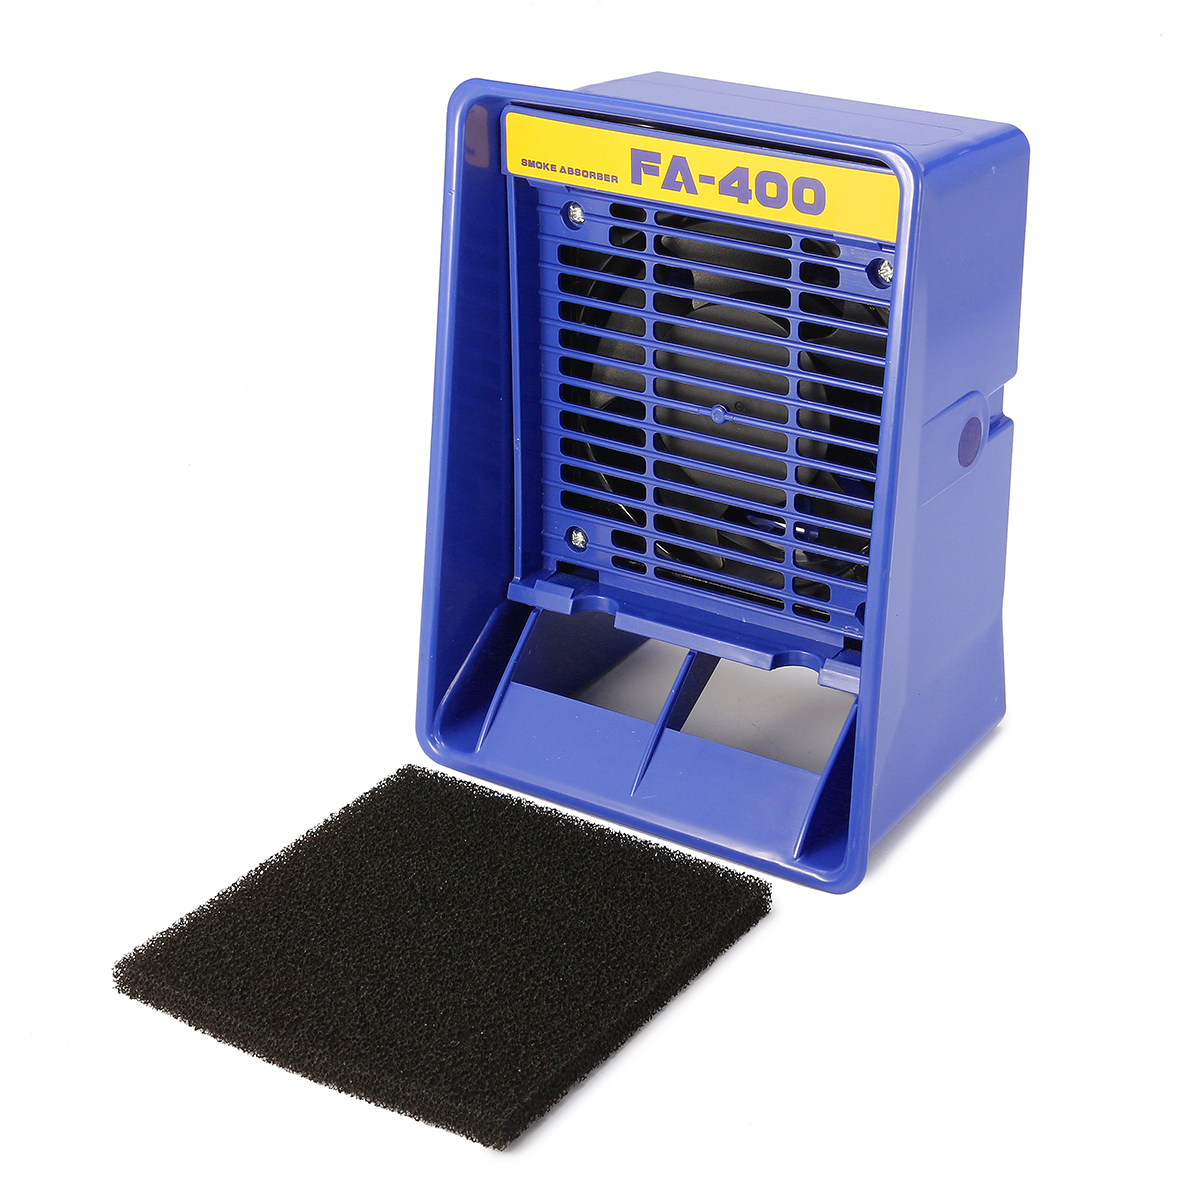 110V Solder Station Smoke Absorber Remover Fume Extractor filter Sodering Fan